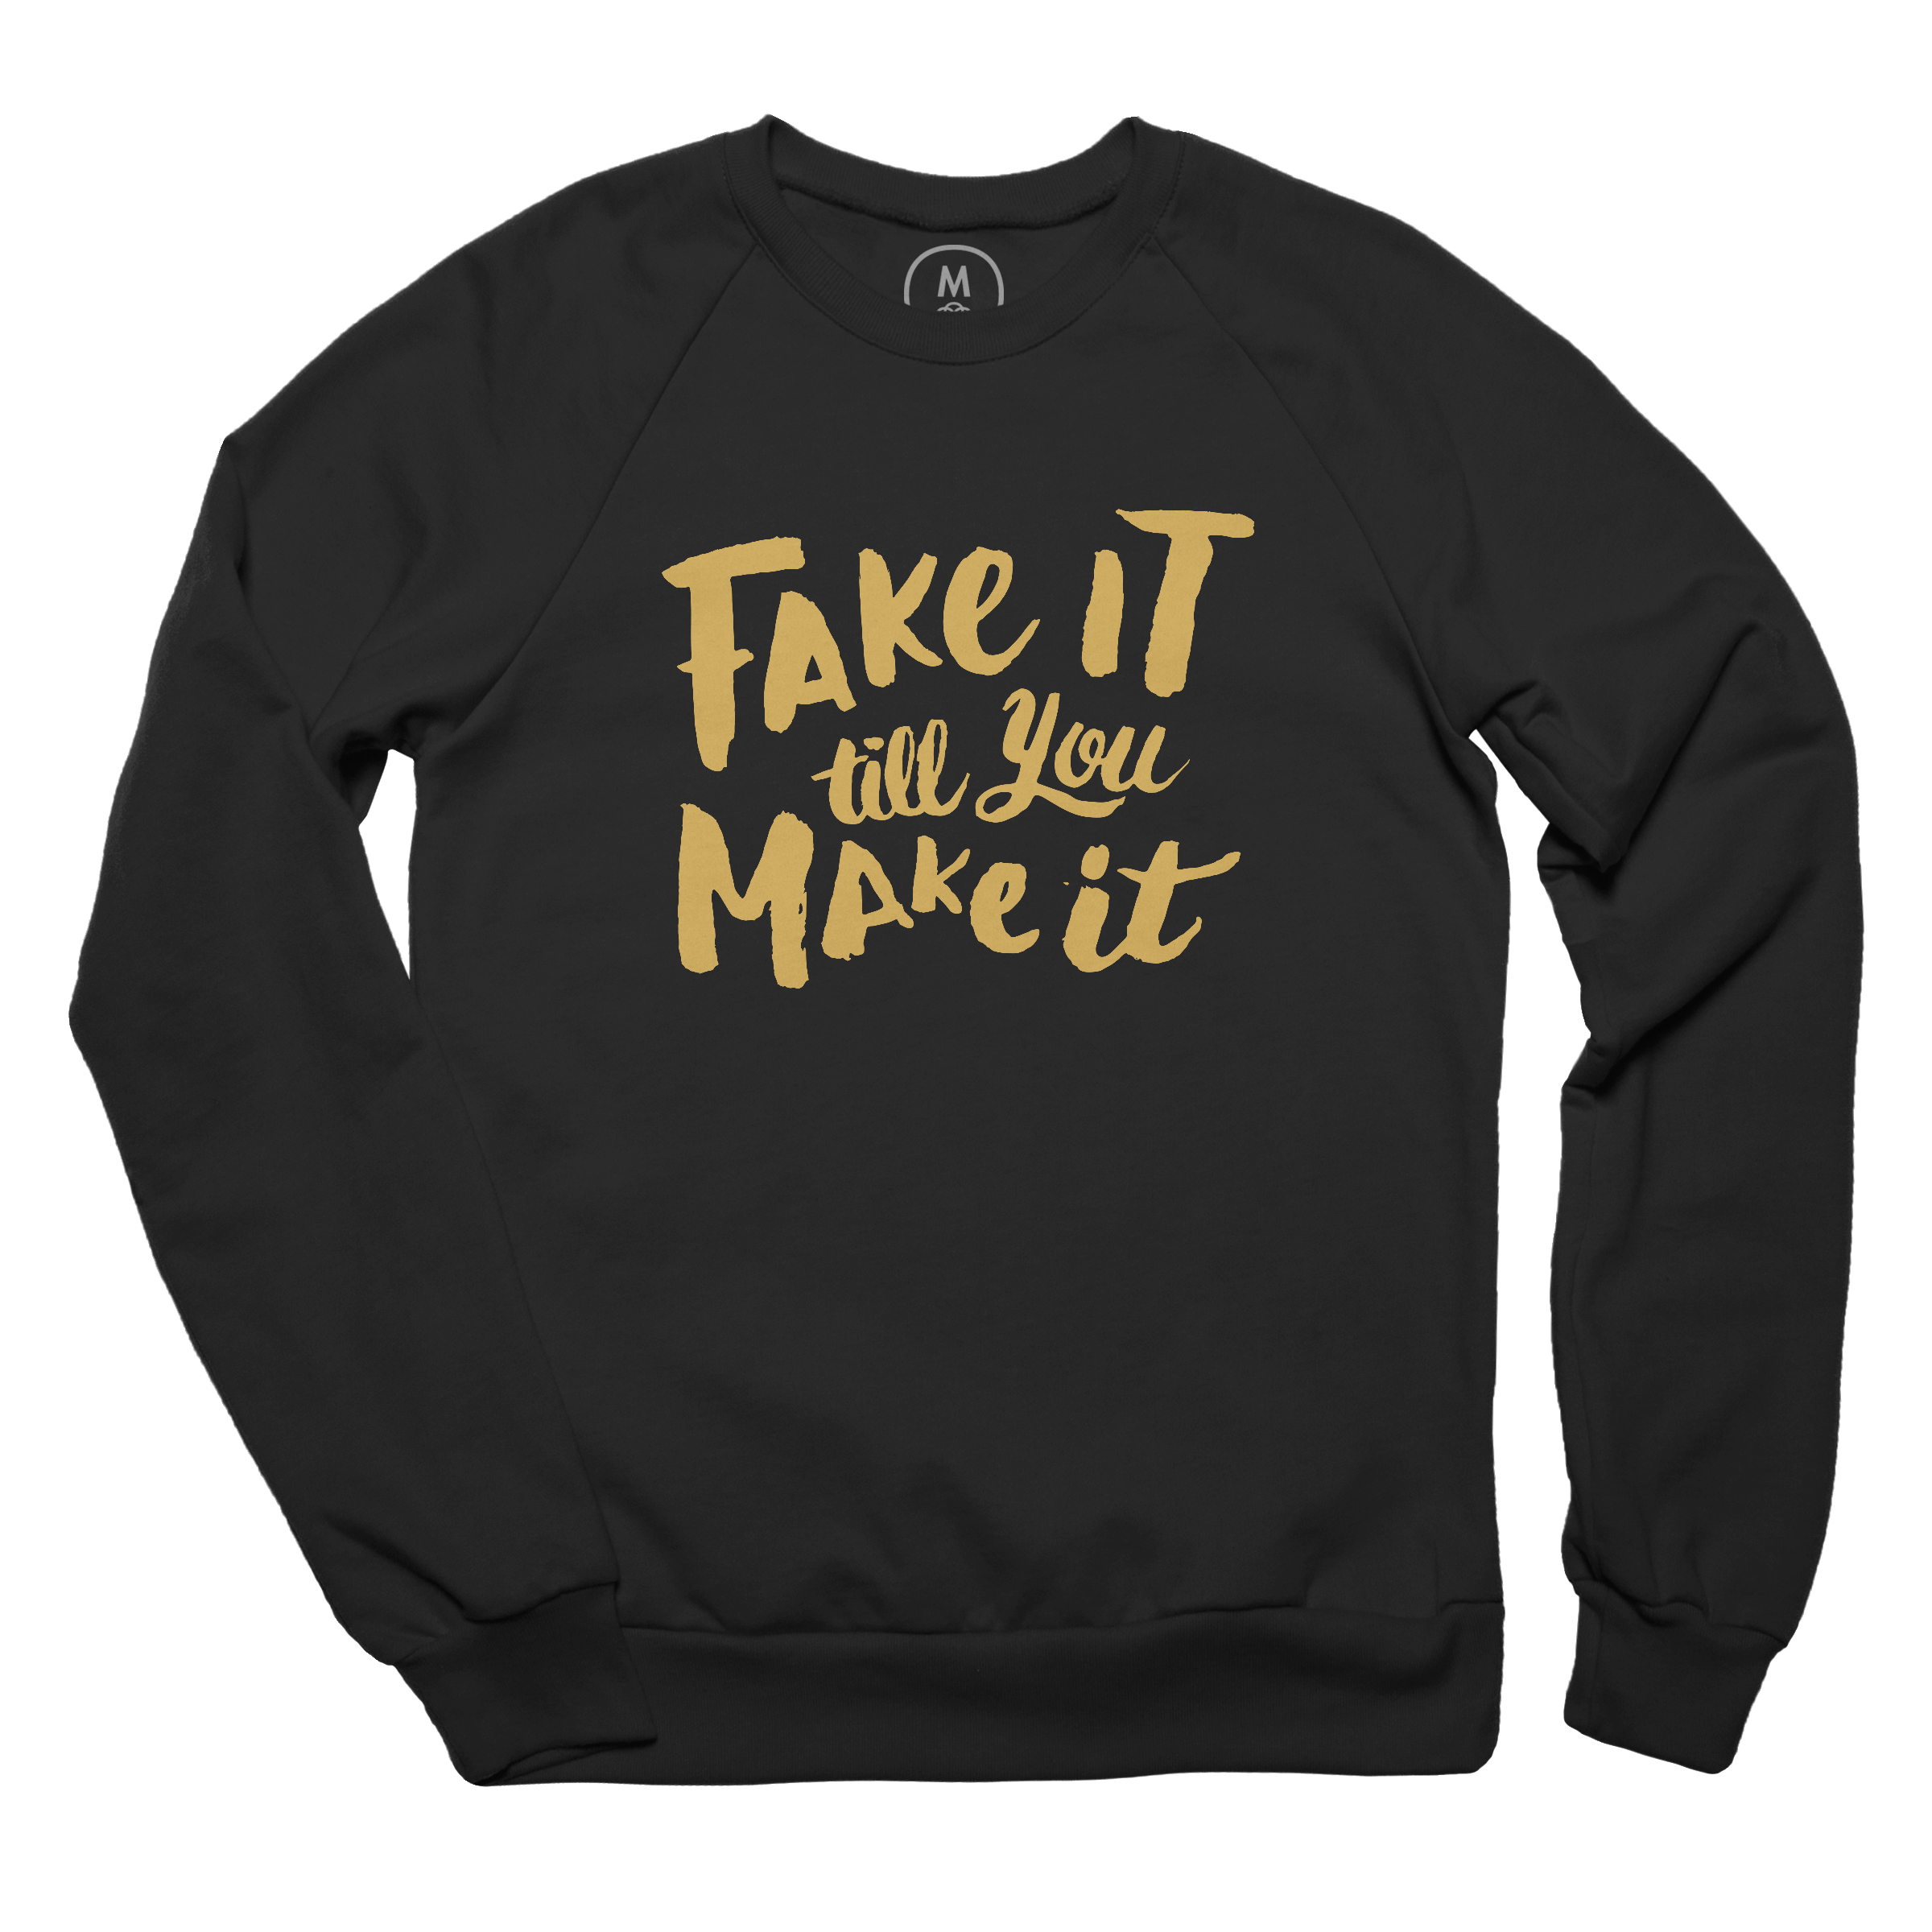 Fake It Till You Make It Pullover Crewneck